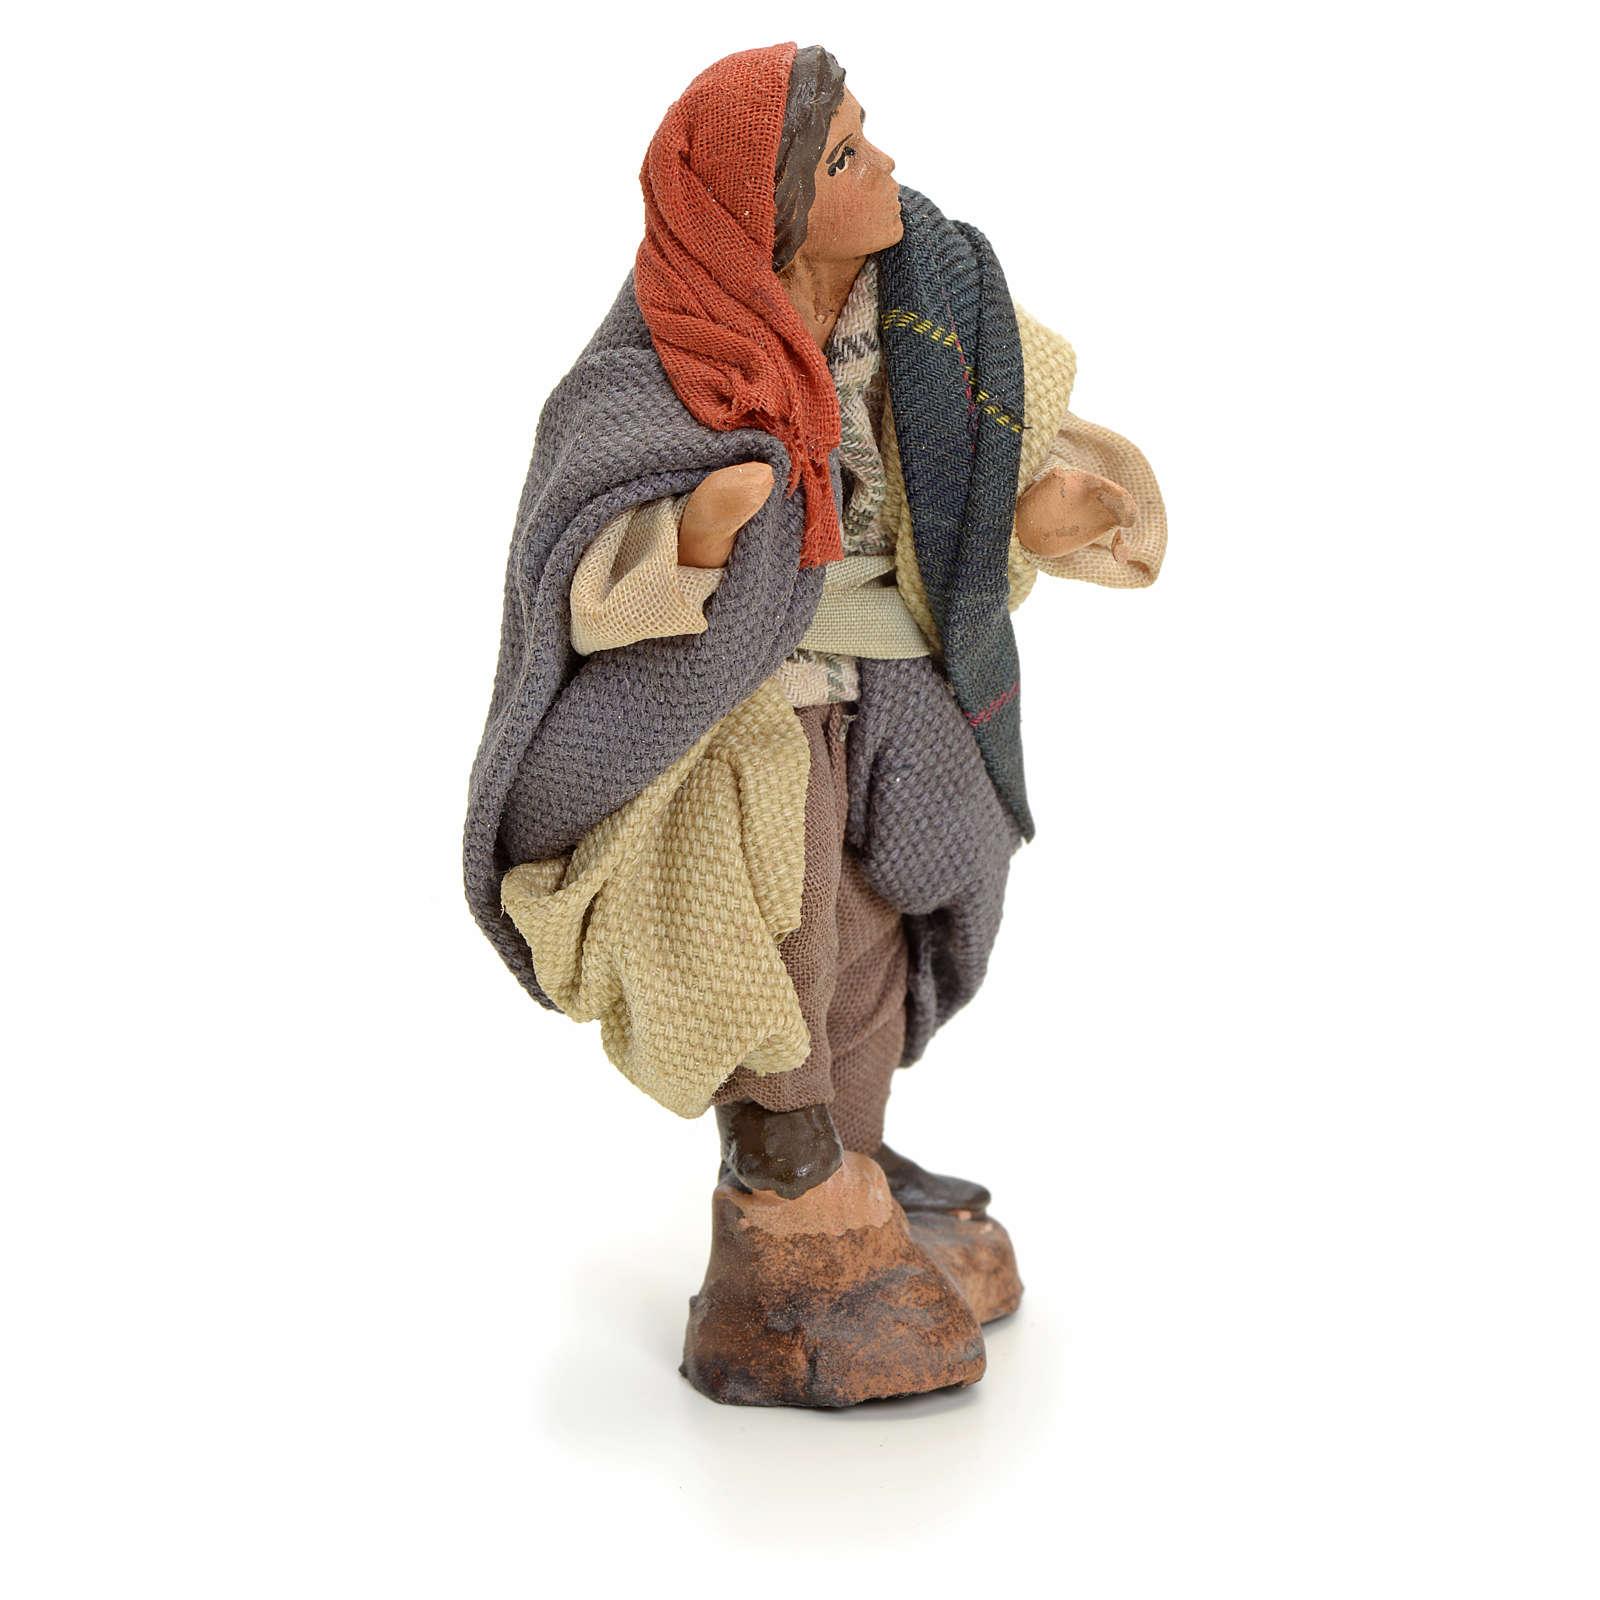 Neapolitan Nativity figurine, knife-grinder, 8 cm 4